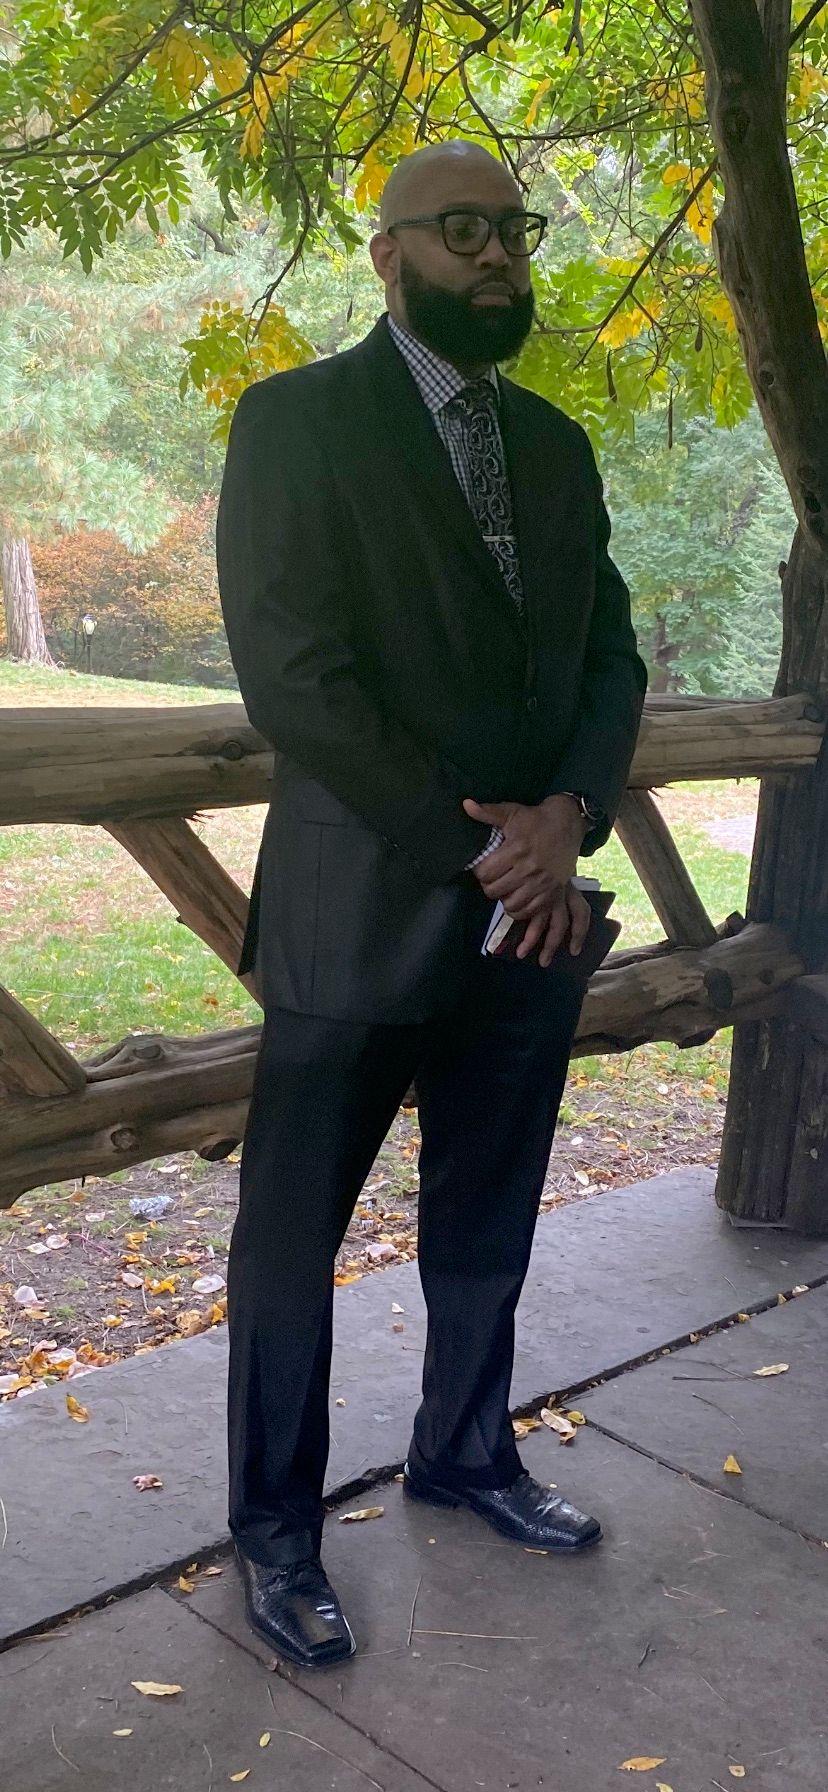 Wedding Officiant - New York 2020